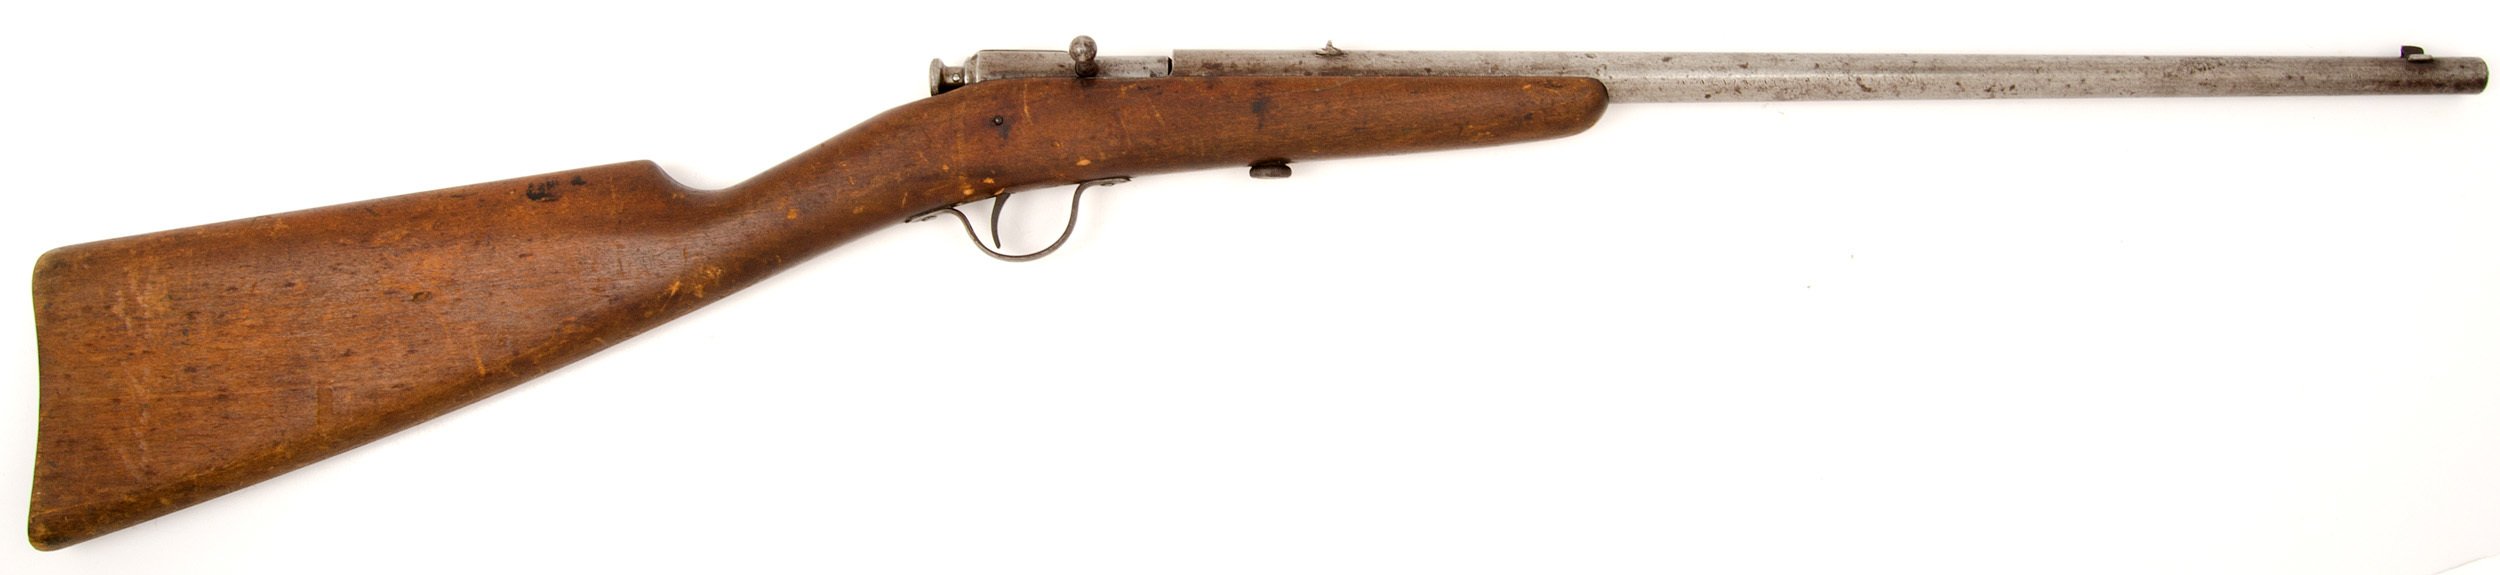 Winchester Model 1900